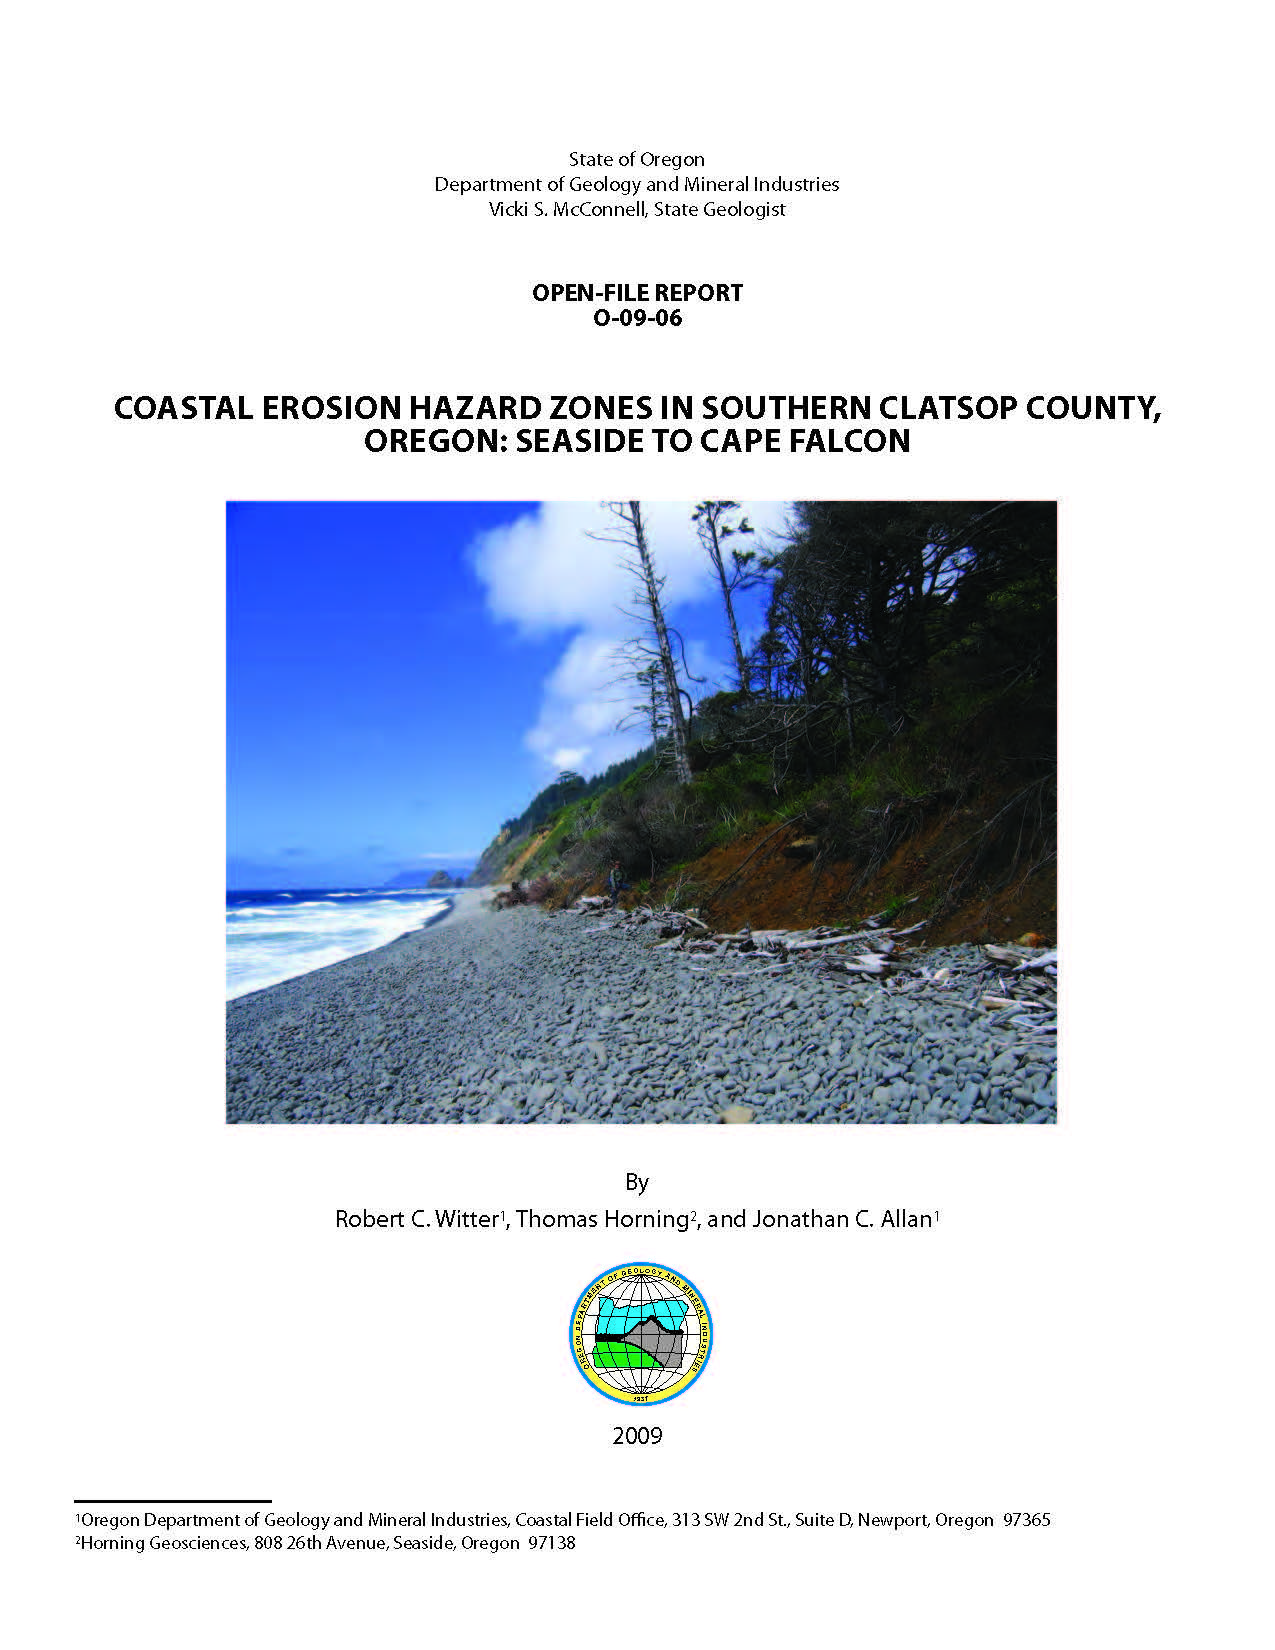 Coastal erosion hazard zones in southern clatsop county